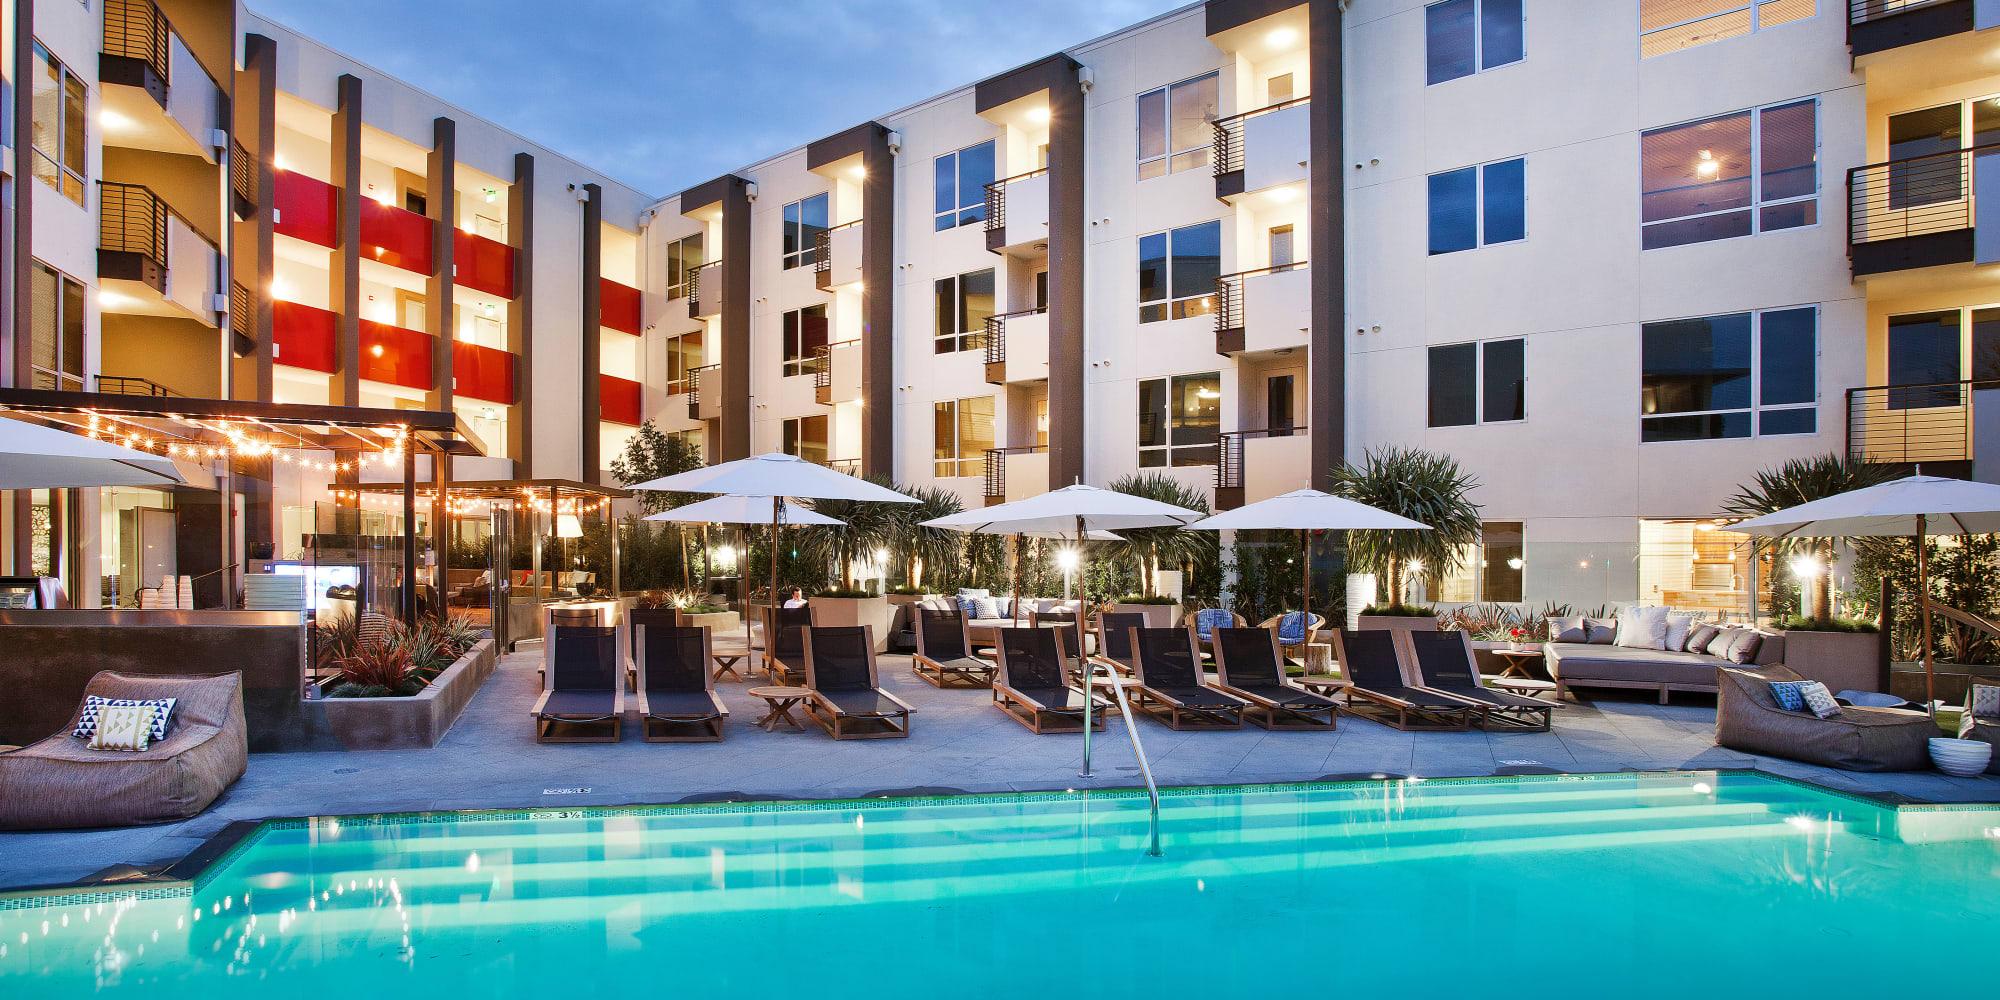 Brio Apartment Homes apartments in Glendale, California